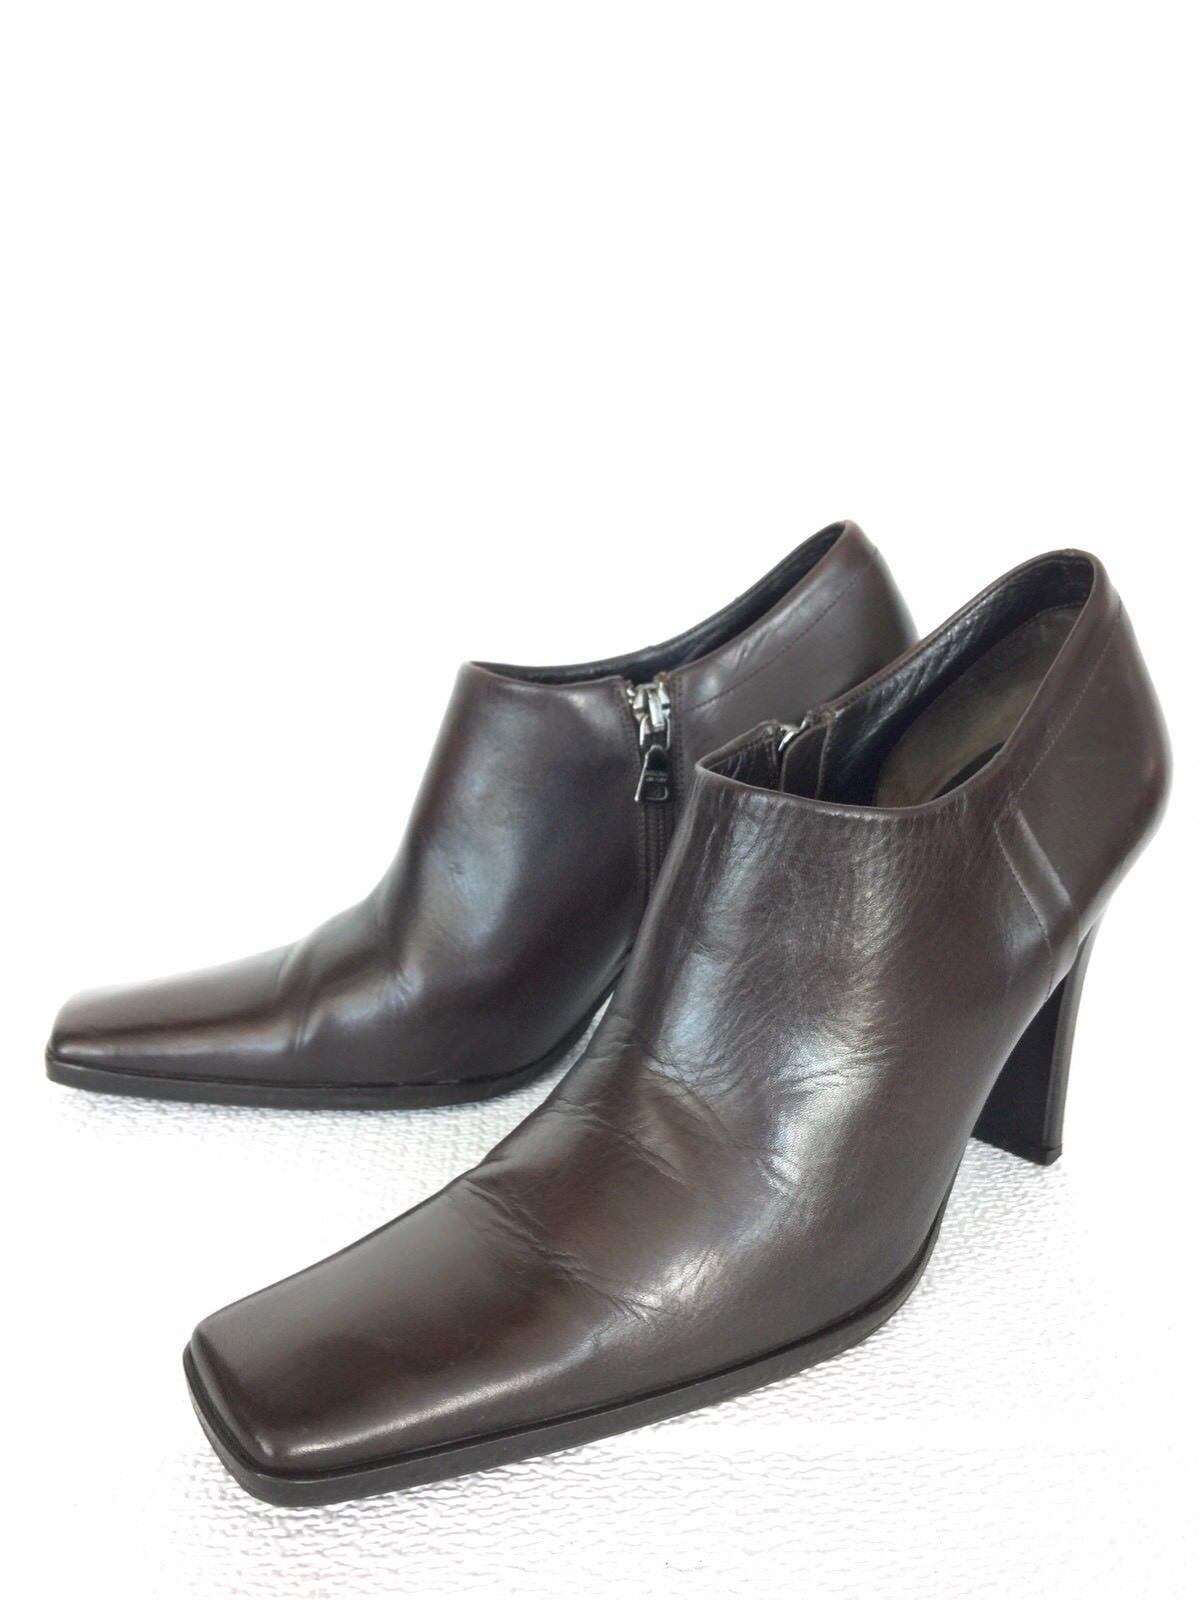 Authentic Prada braun Leather Ankle Stiefel Stiefelies schuhe, Größe 36.5, 6.5